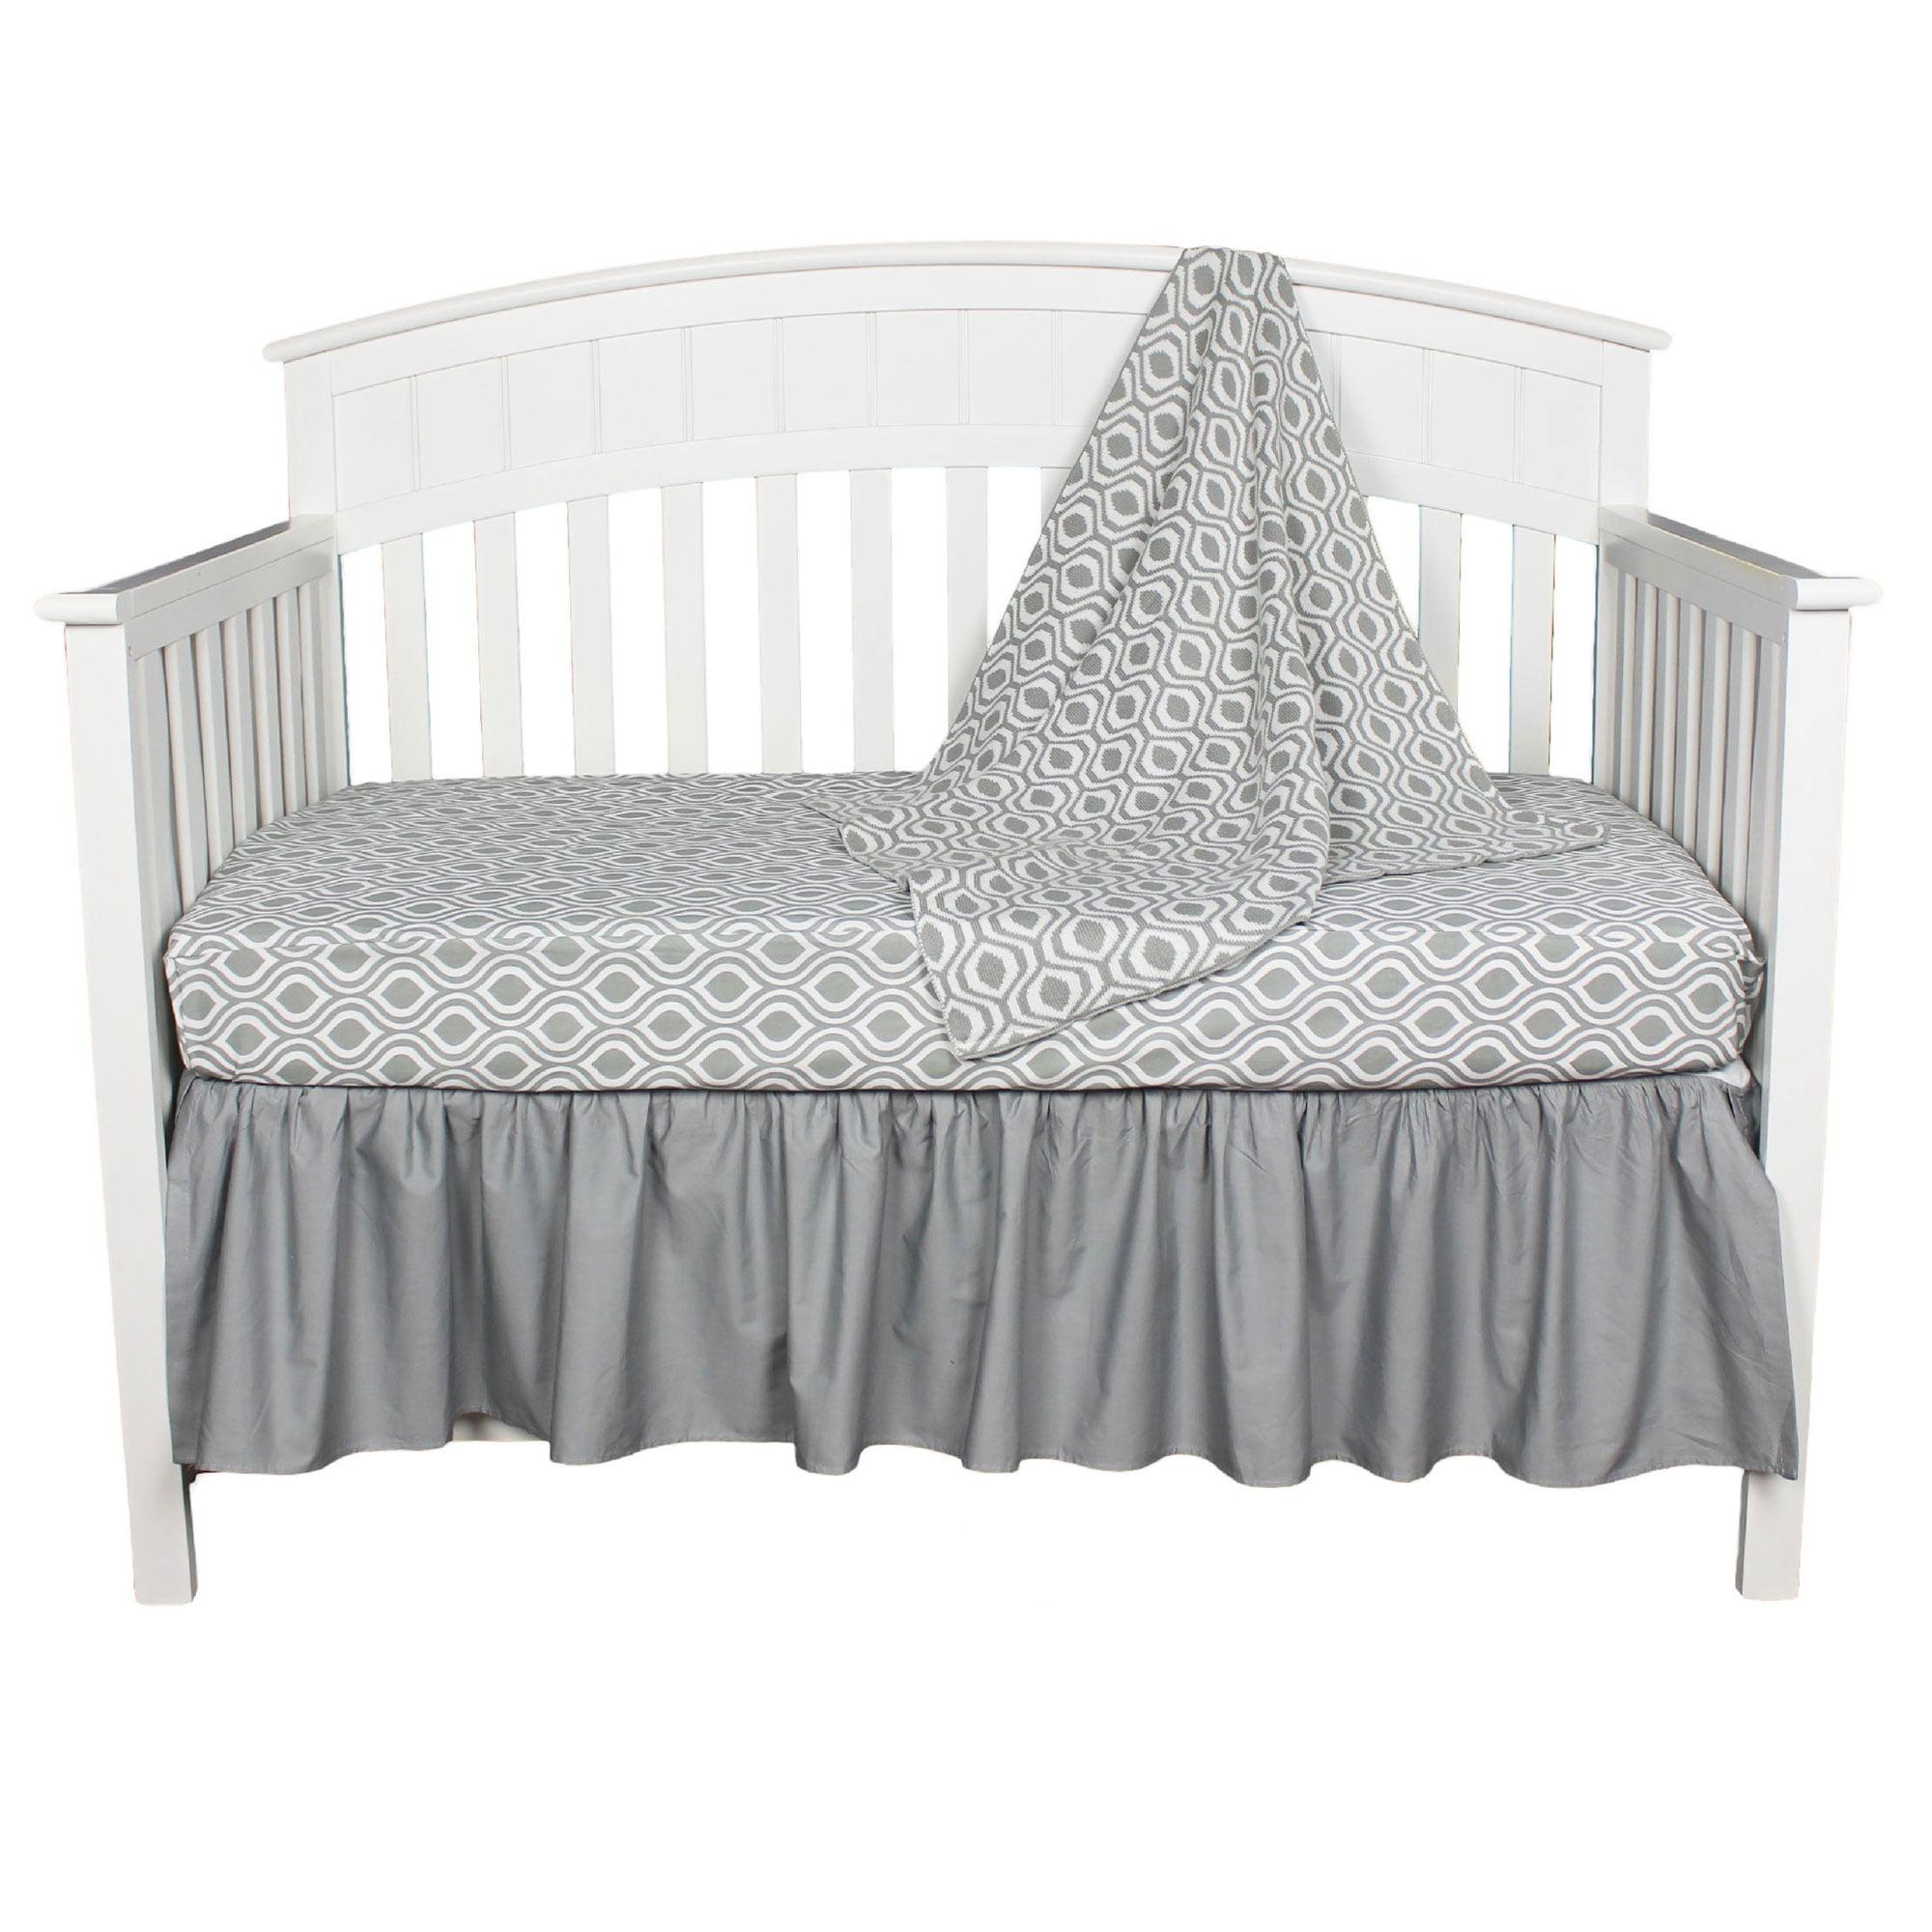 American Baby Company Crib Bedding Set - Grey and White Ogee - 3 Piece Baby Crib Bedding Set